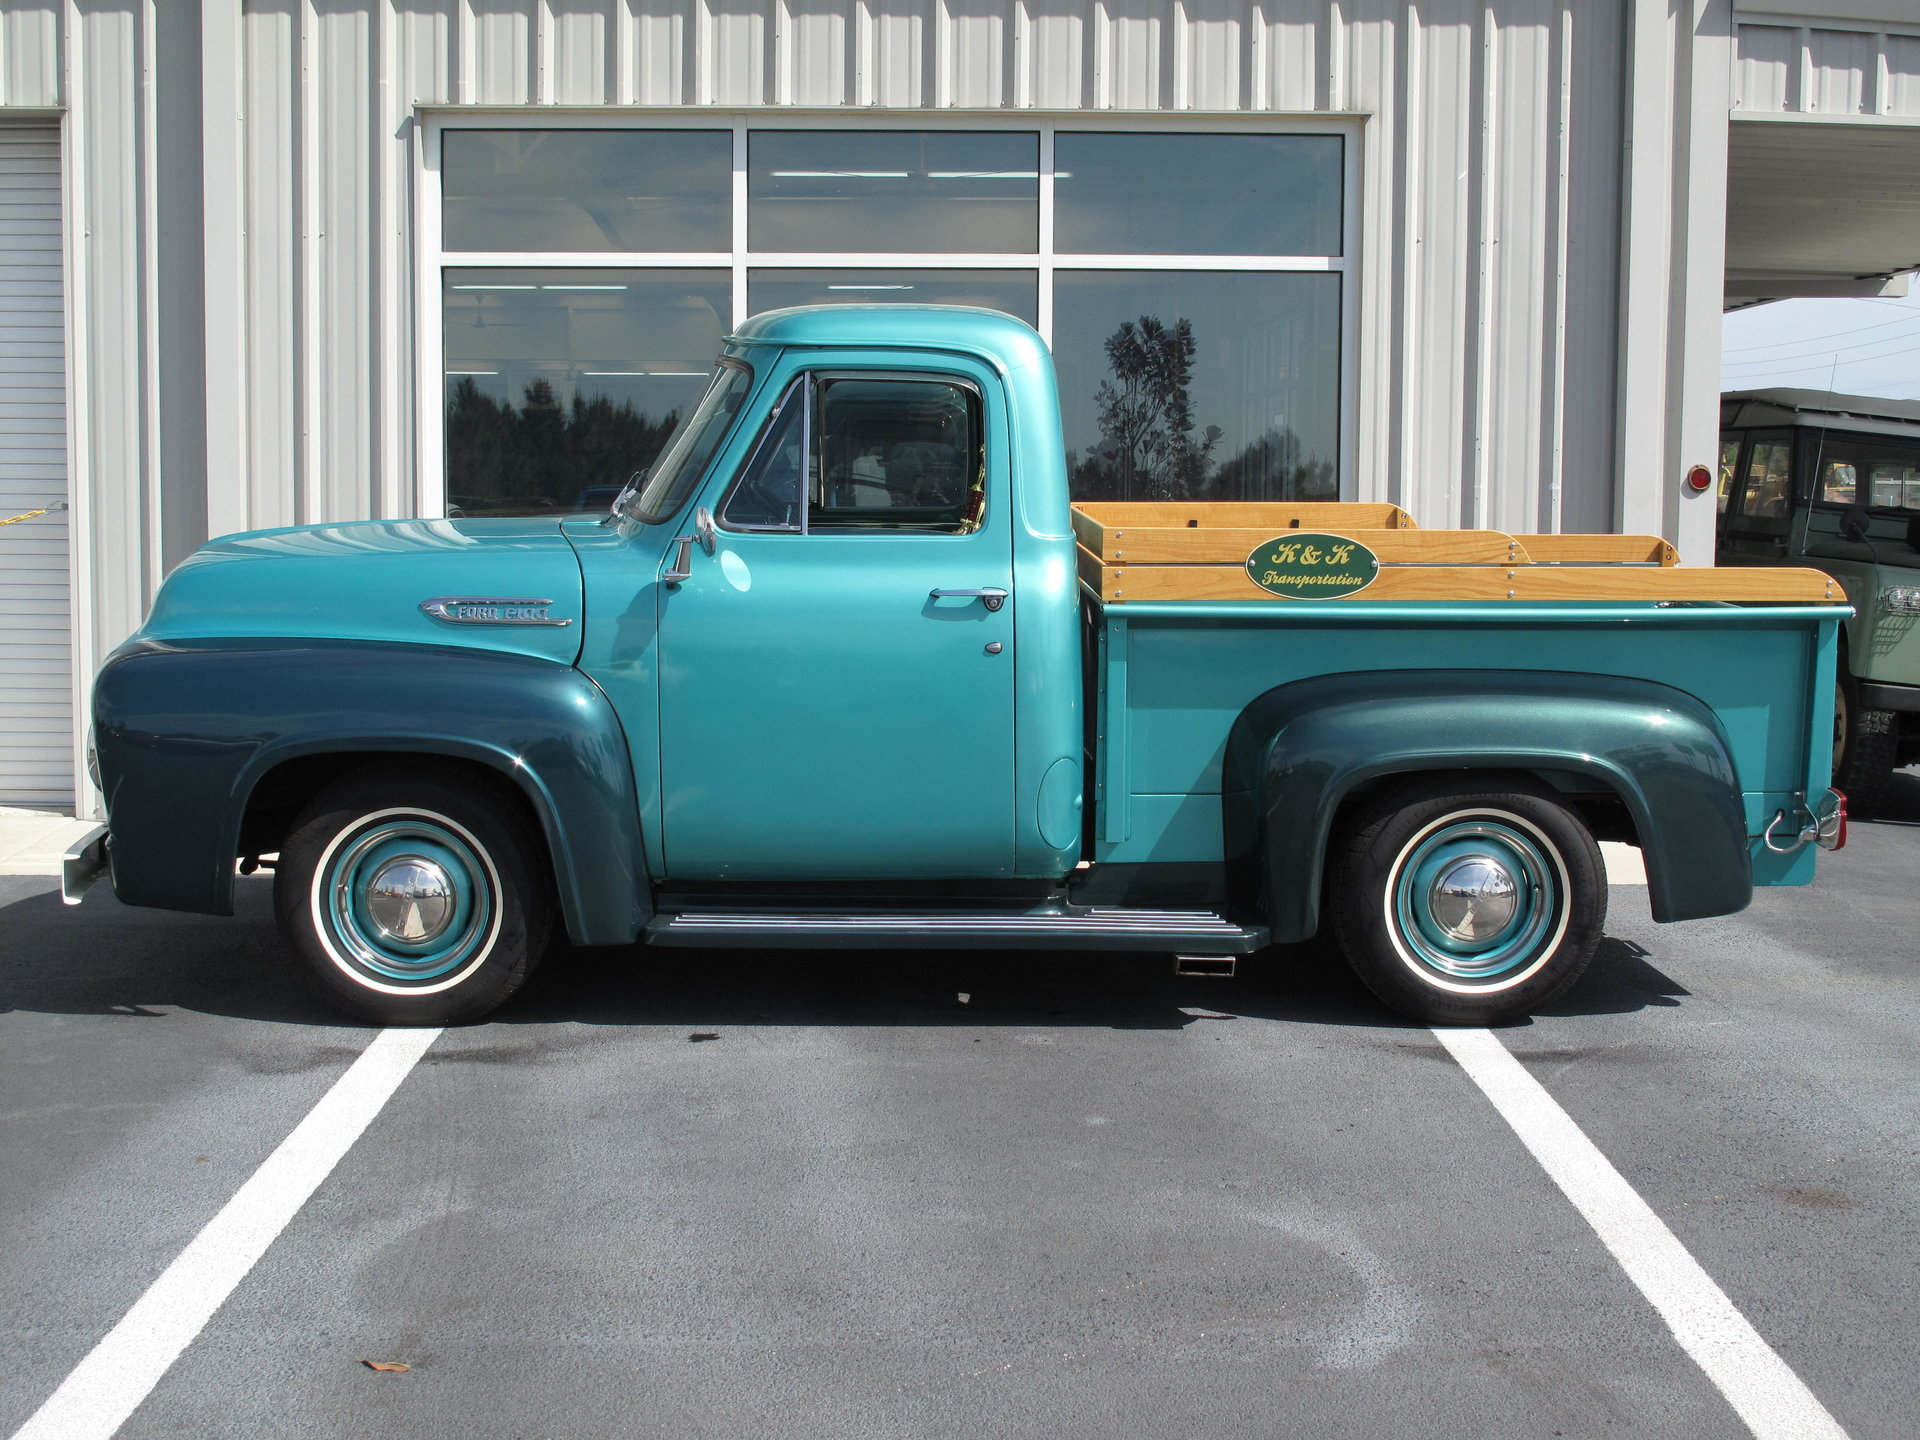 1954 Ford F100 Burnyzz American Classic Horse Power Truck